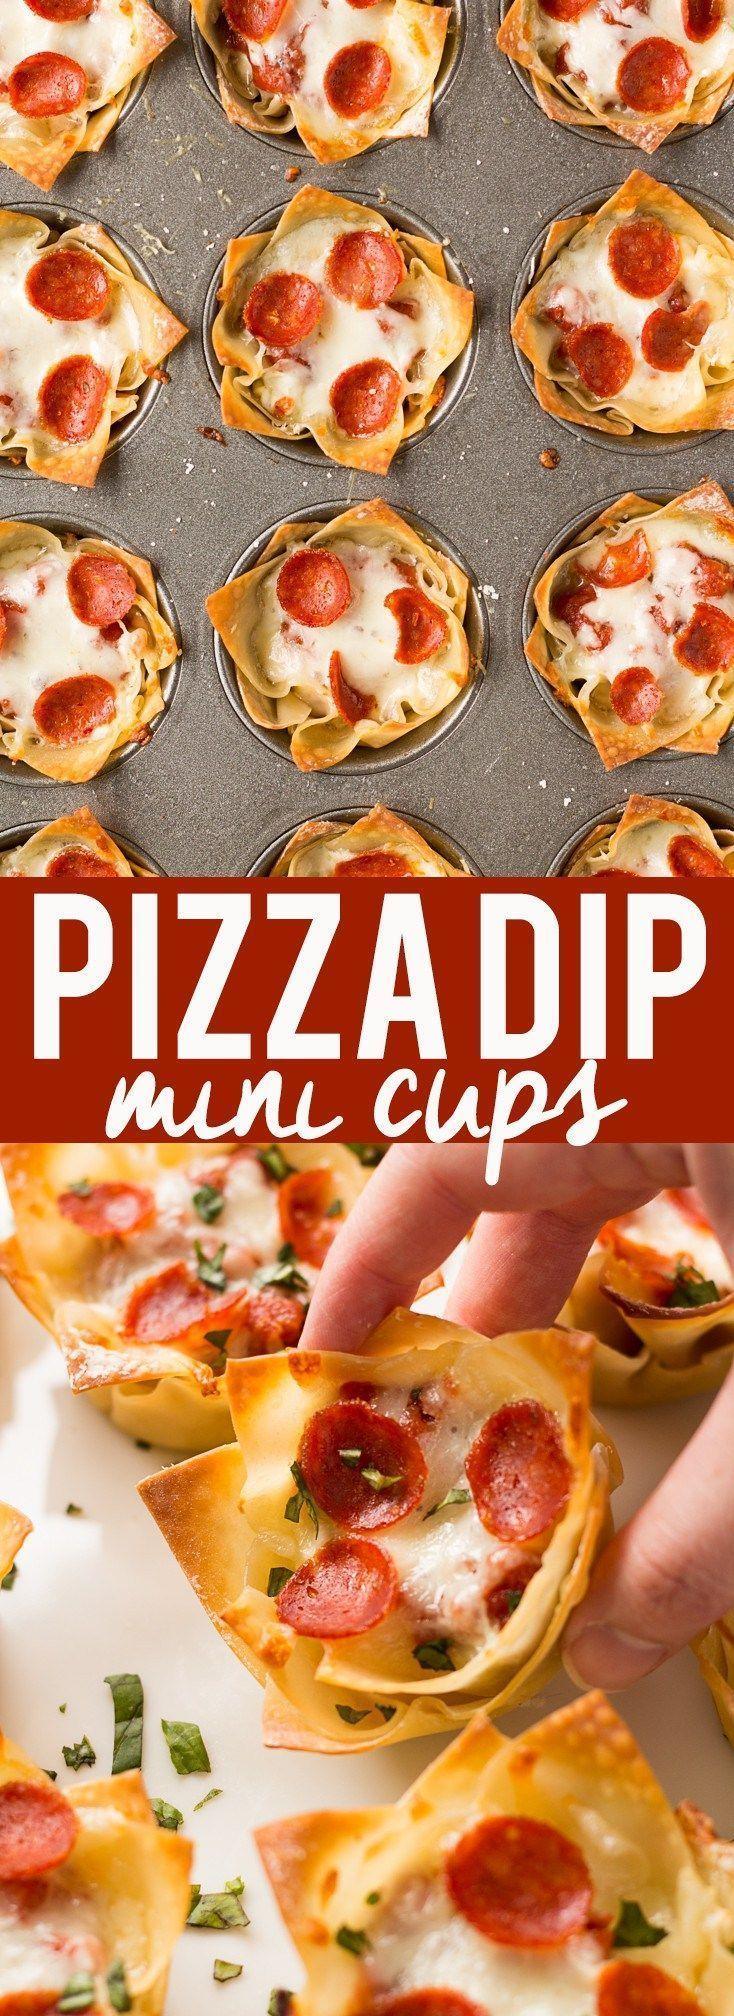 Mini Pizza Dip Cups #tailgatefood